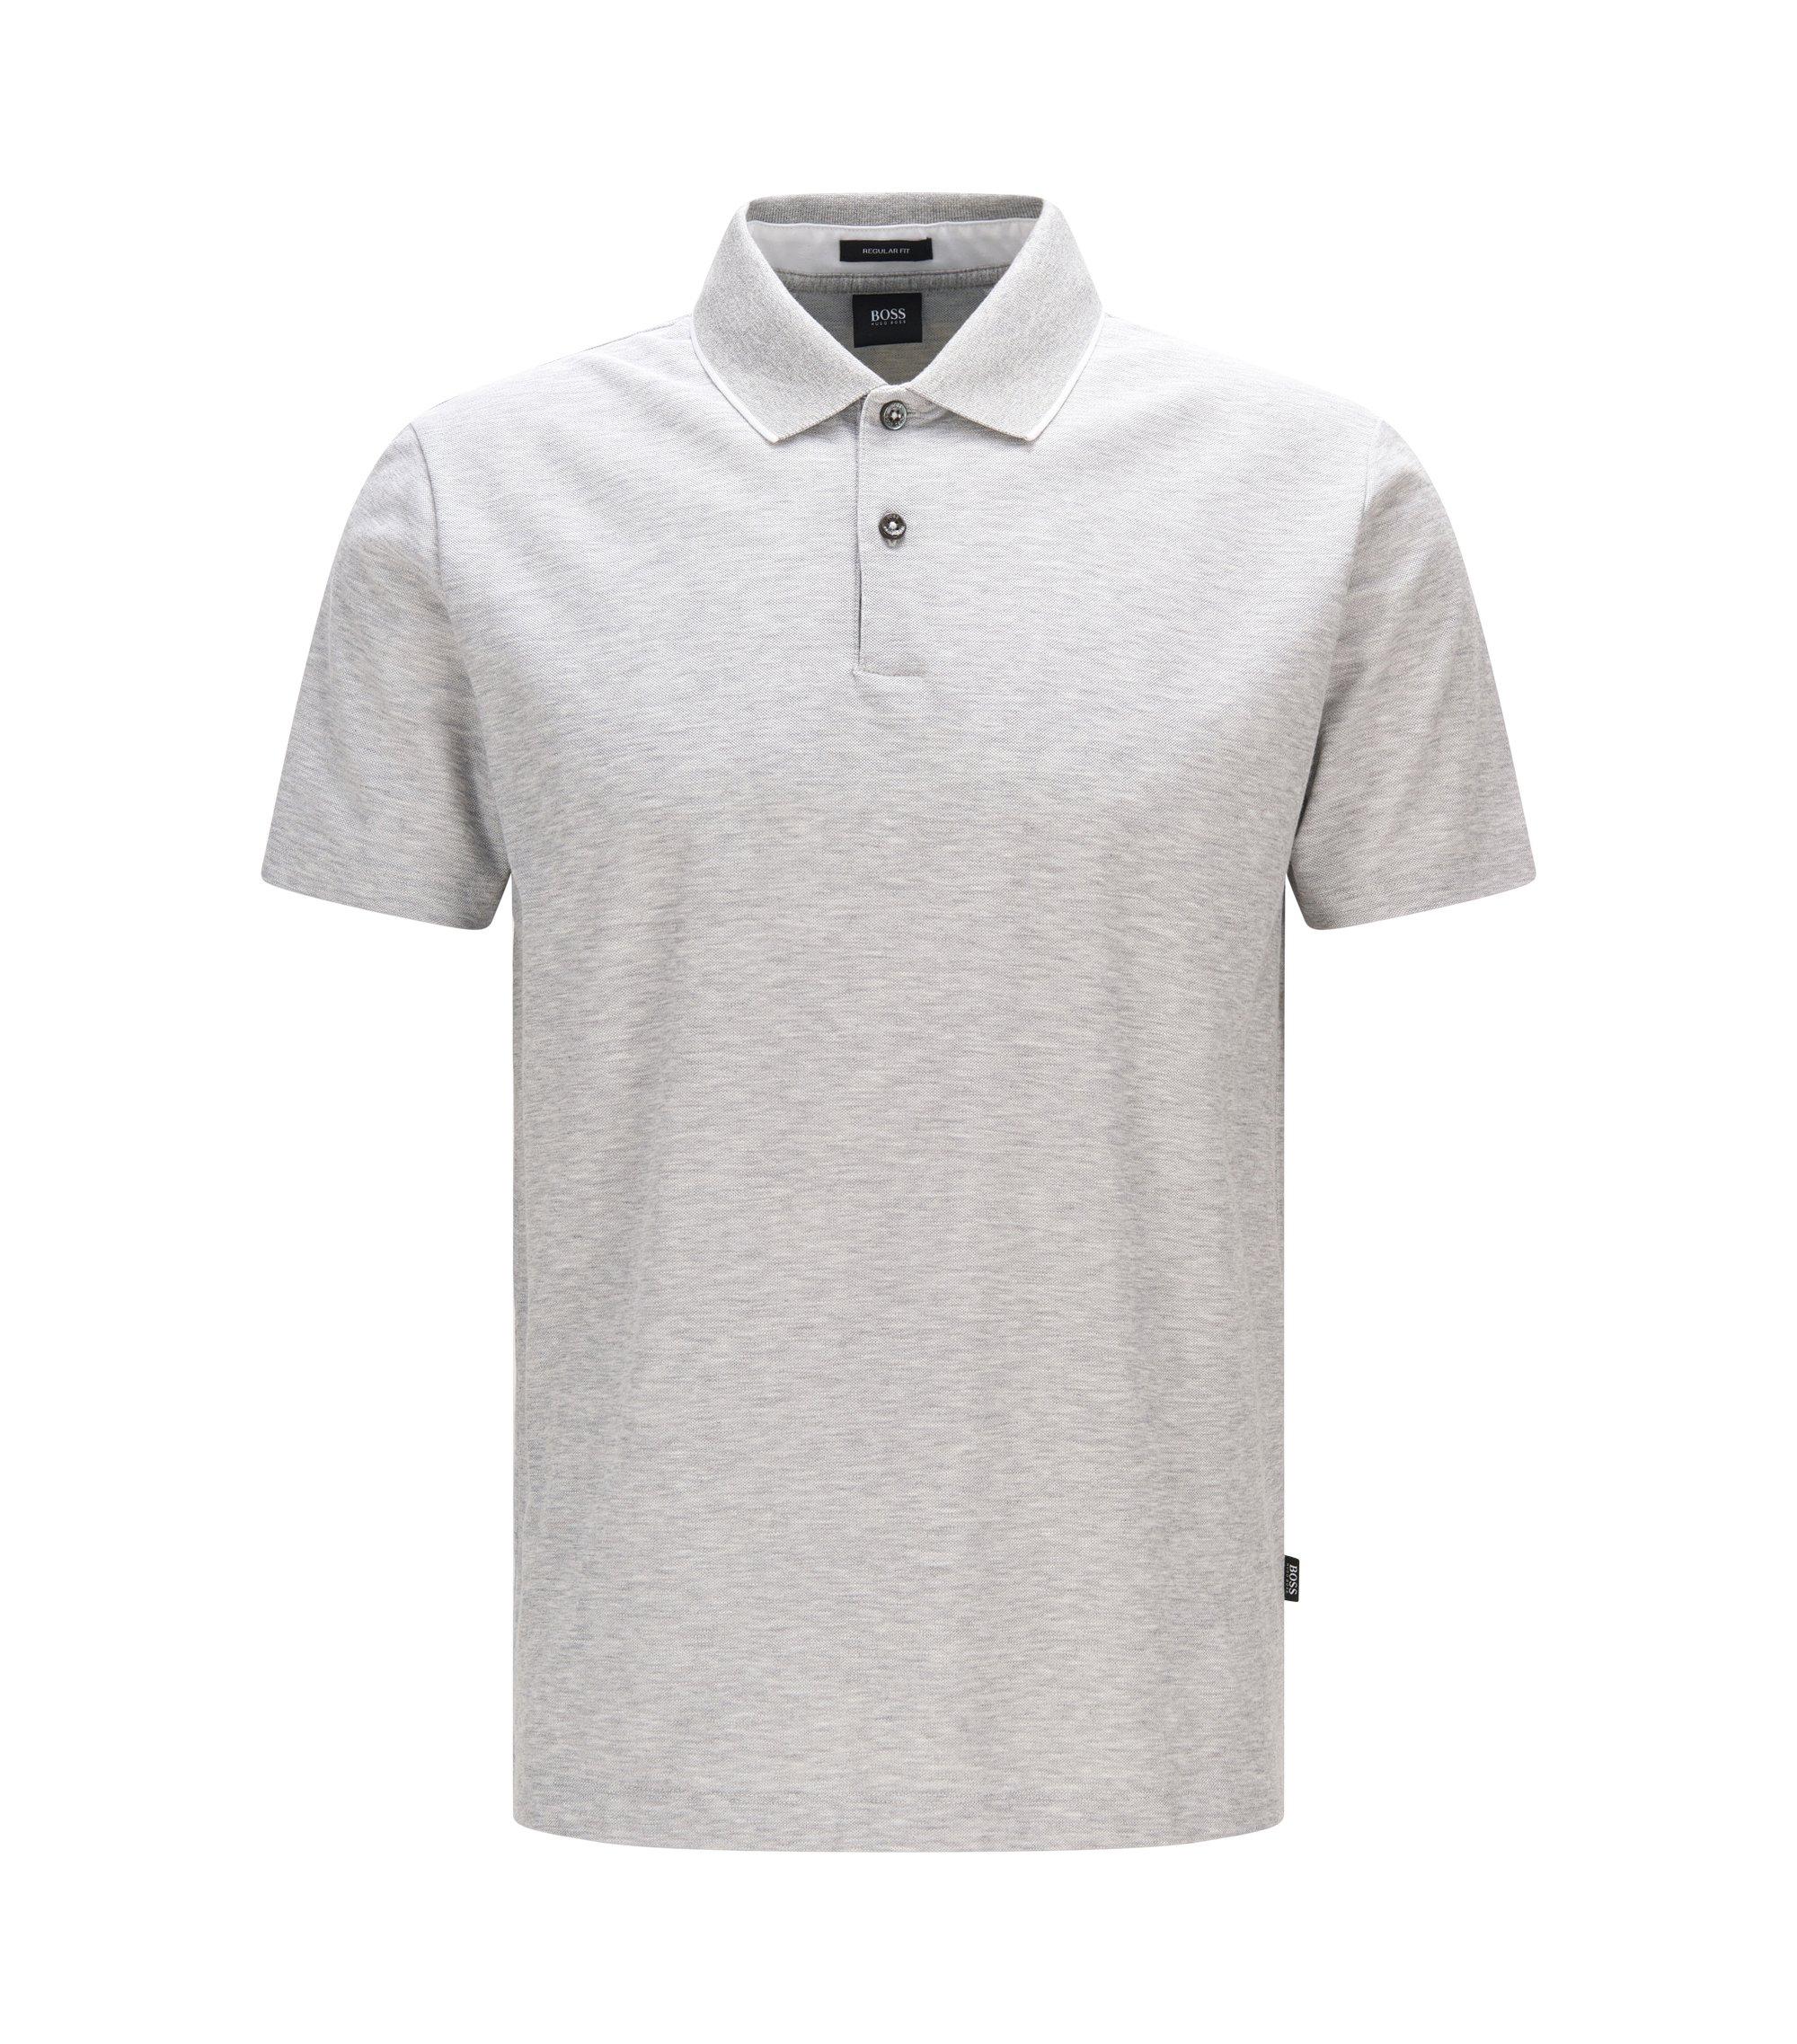 Cotton Polo Shirt, Regular Fit   Piket, Open Grey